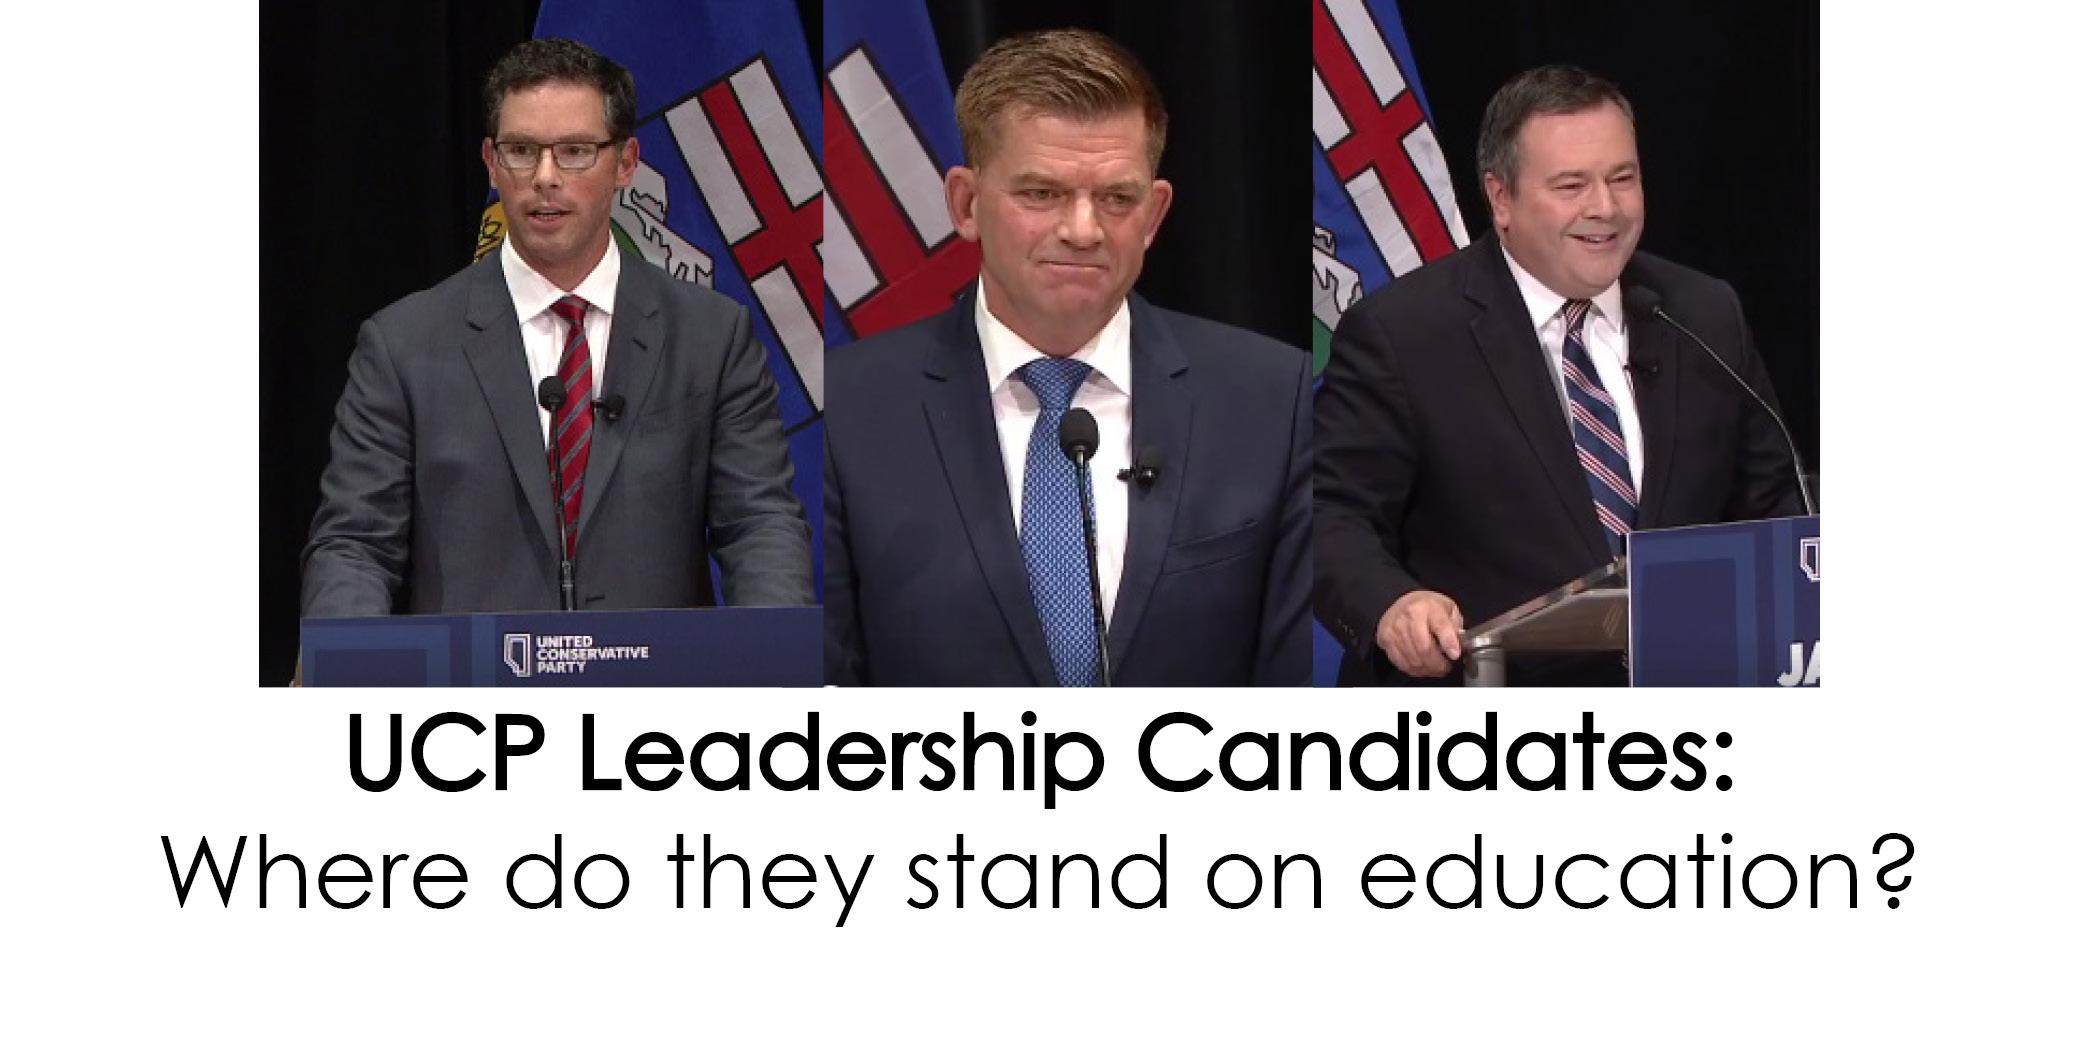 UCP_Leadership_Candidates02.jpg